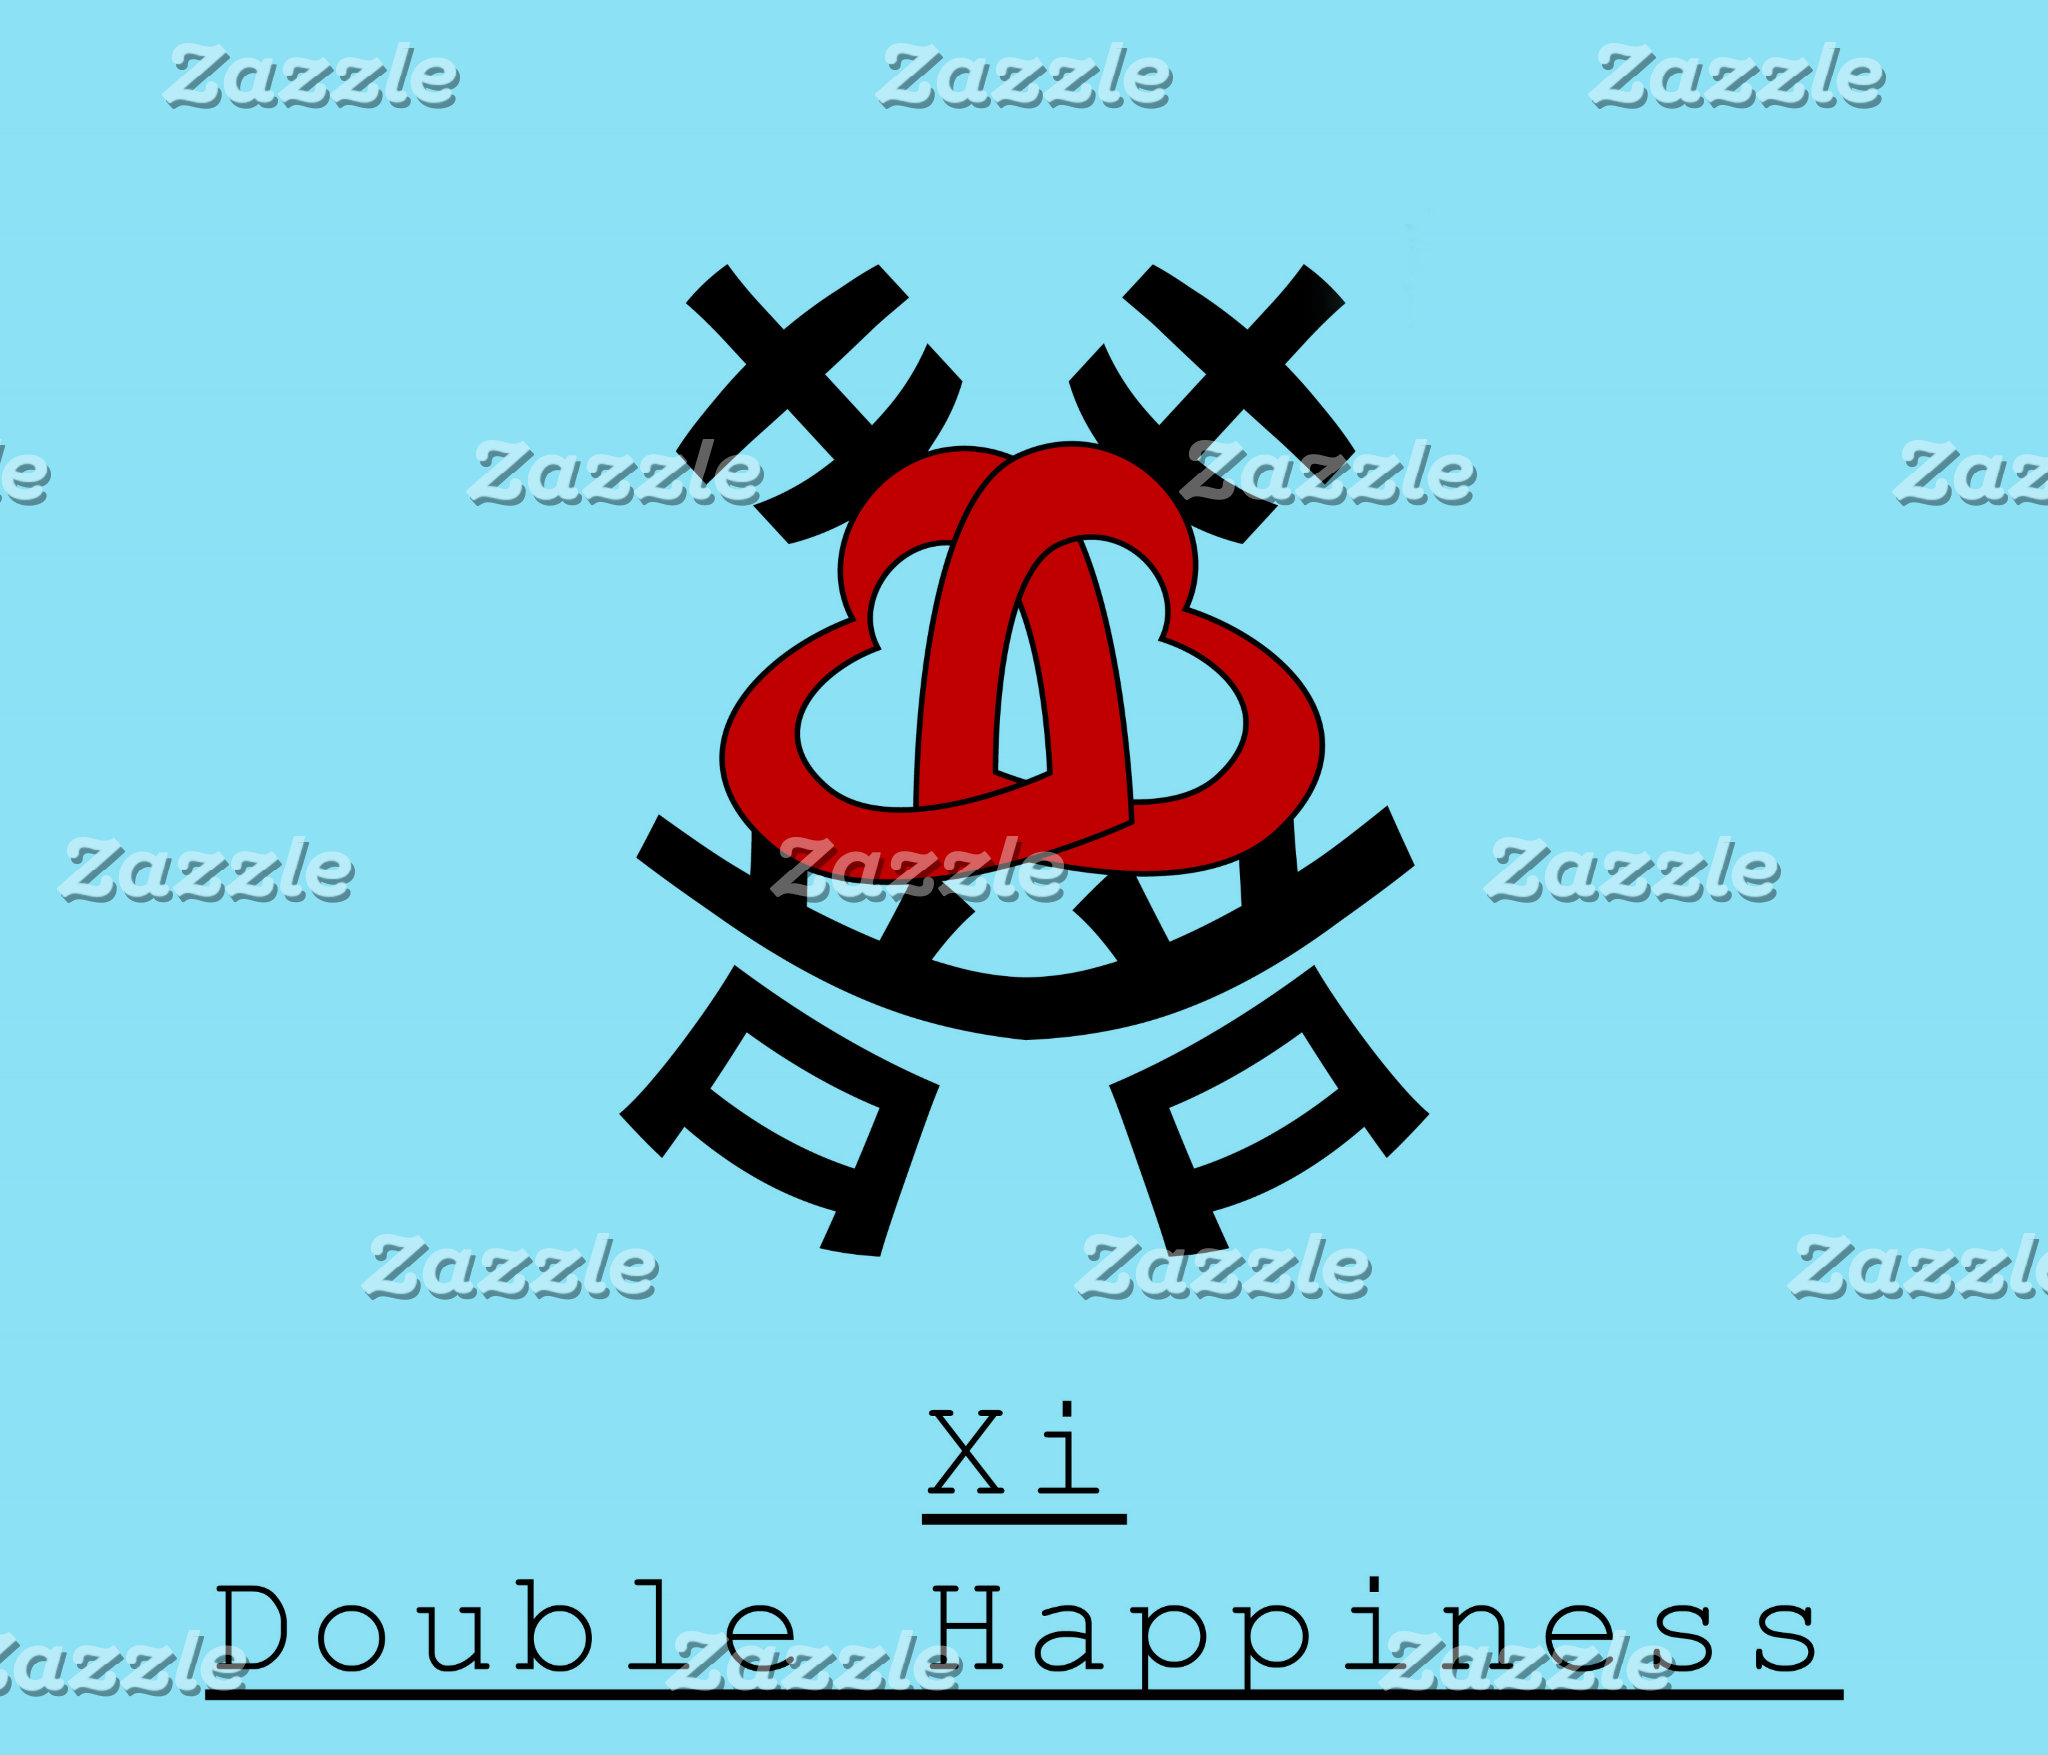 Double Happiness (囍 xi)